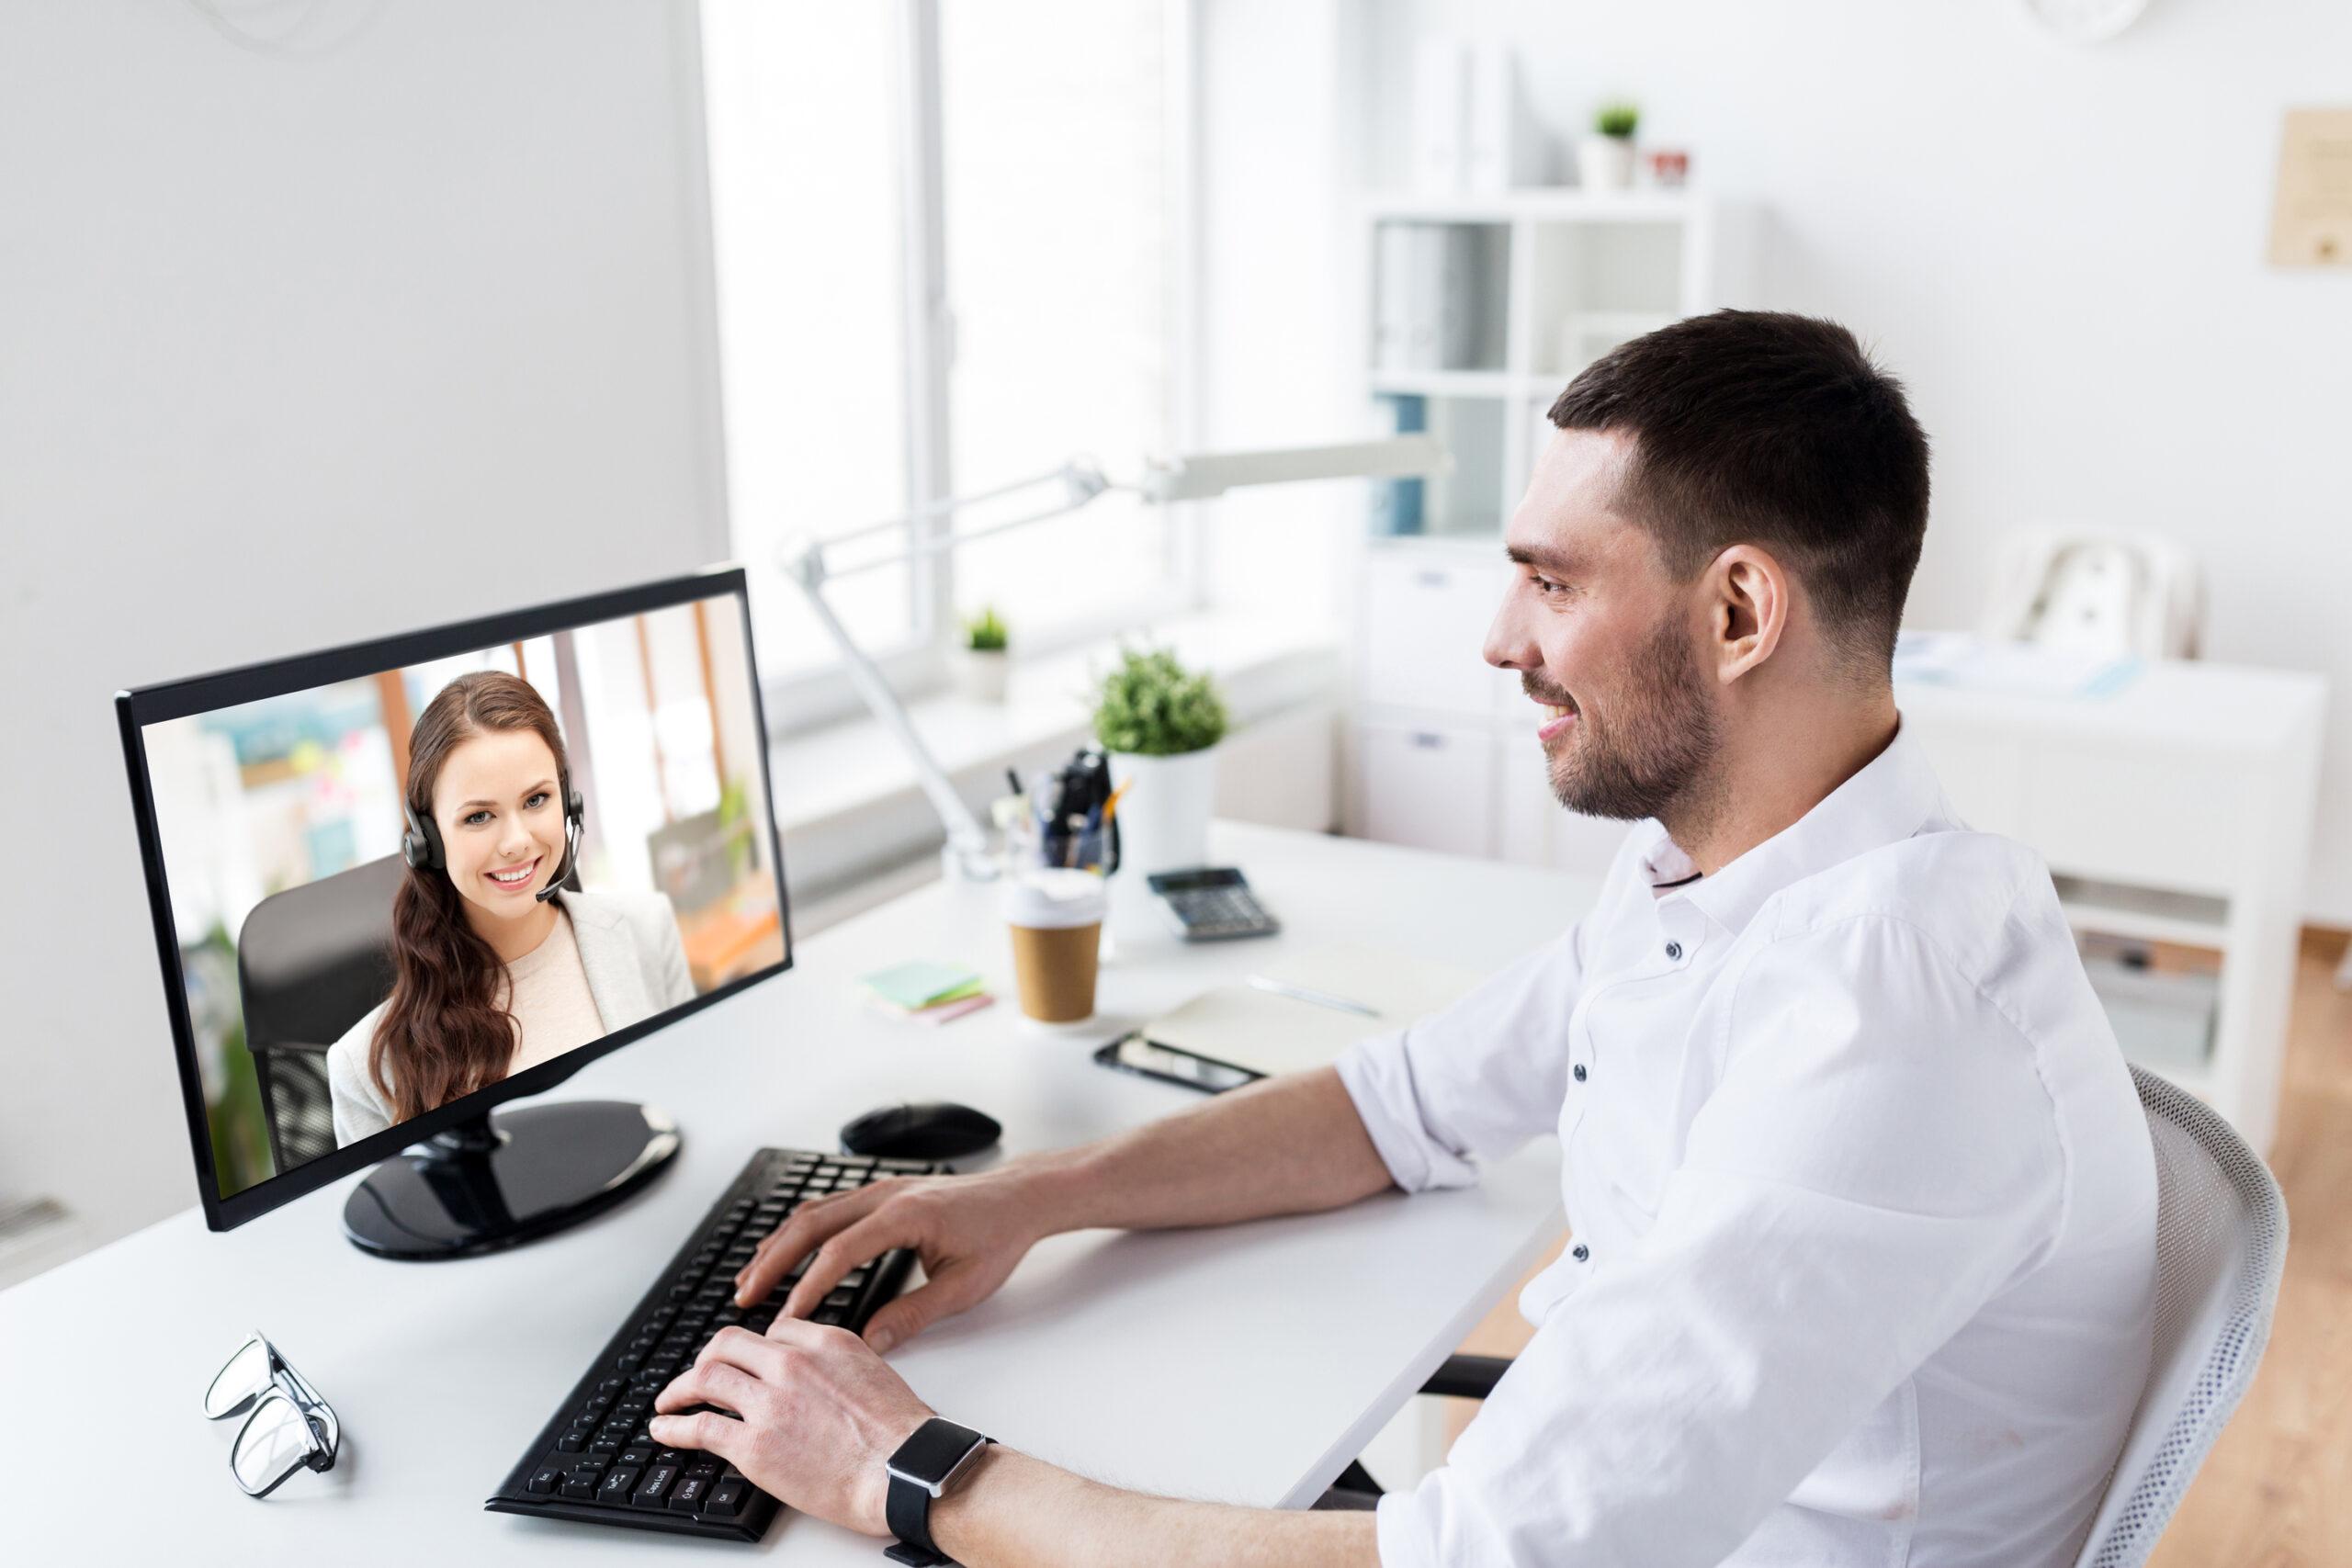 Pracovní pohovor dnes často probíhá formou online pohovoru.